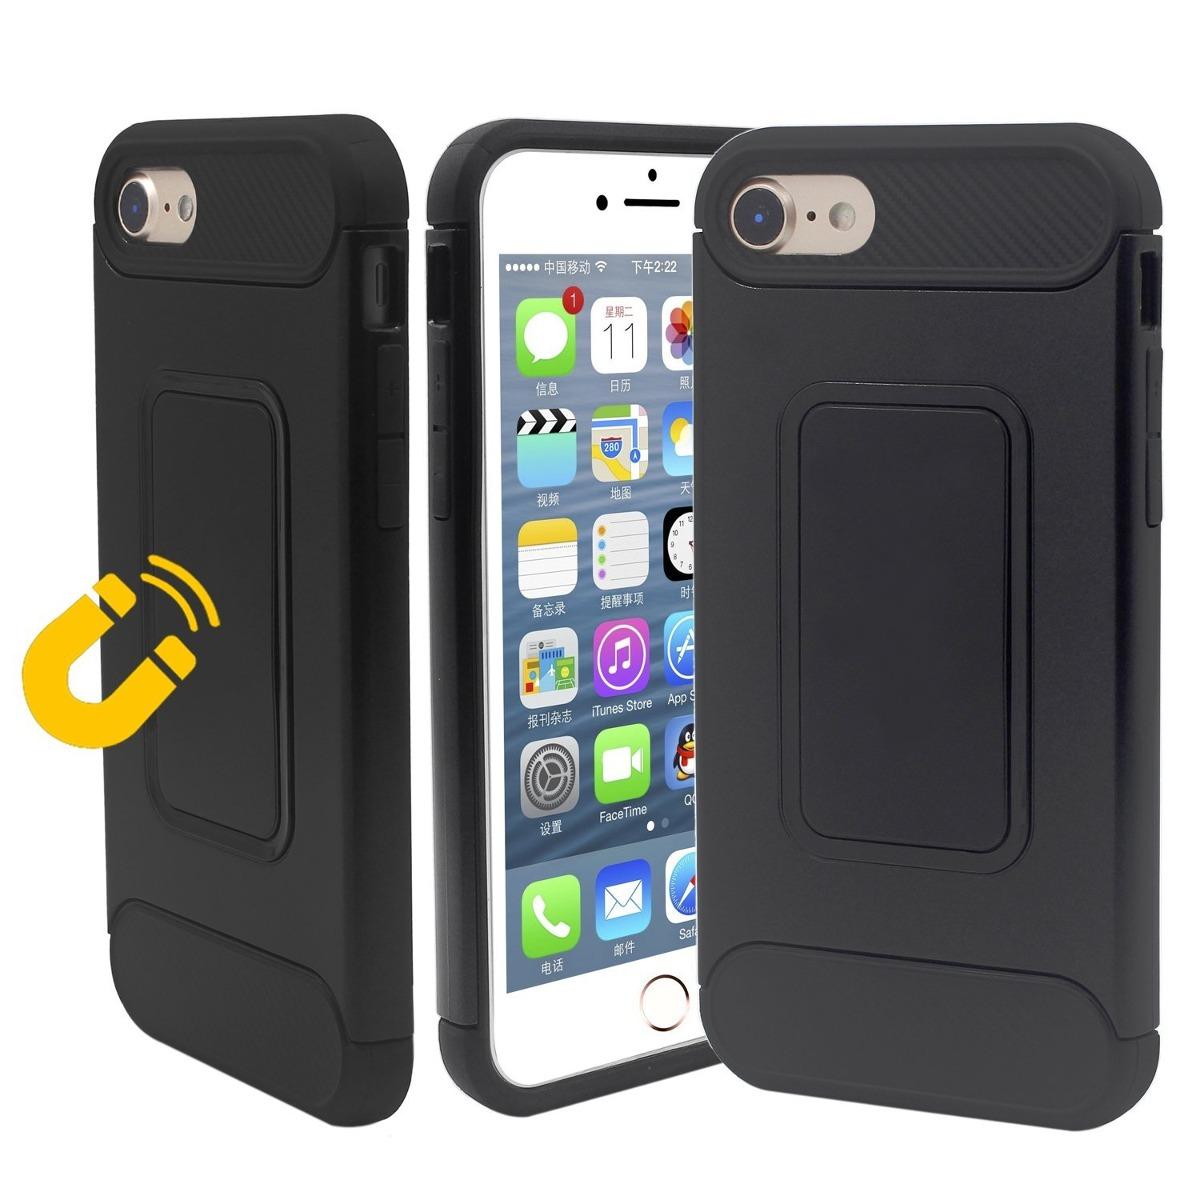 carcasa iphone 7 golpes